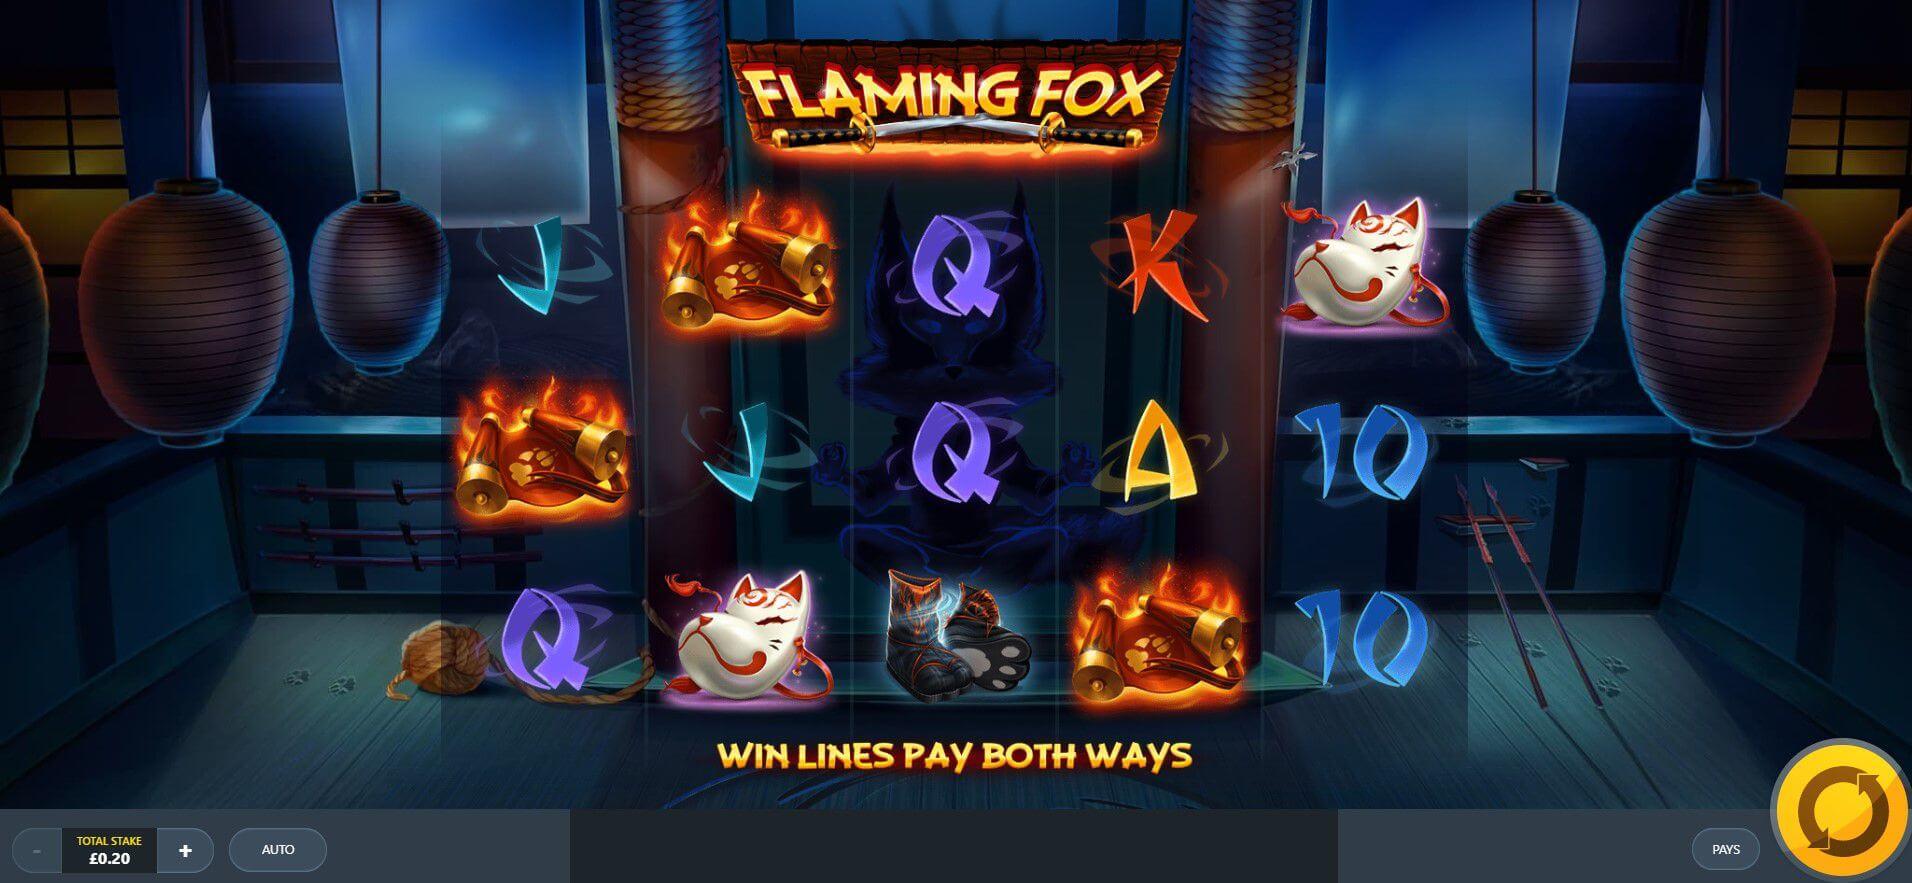 Flaming Fox Slot Gameplay